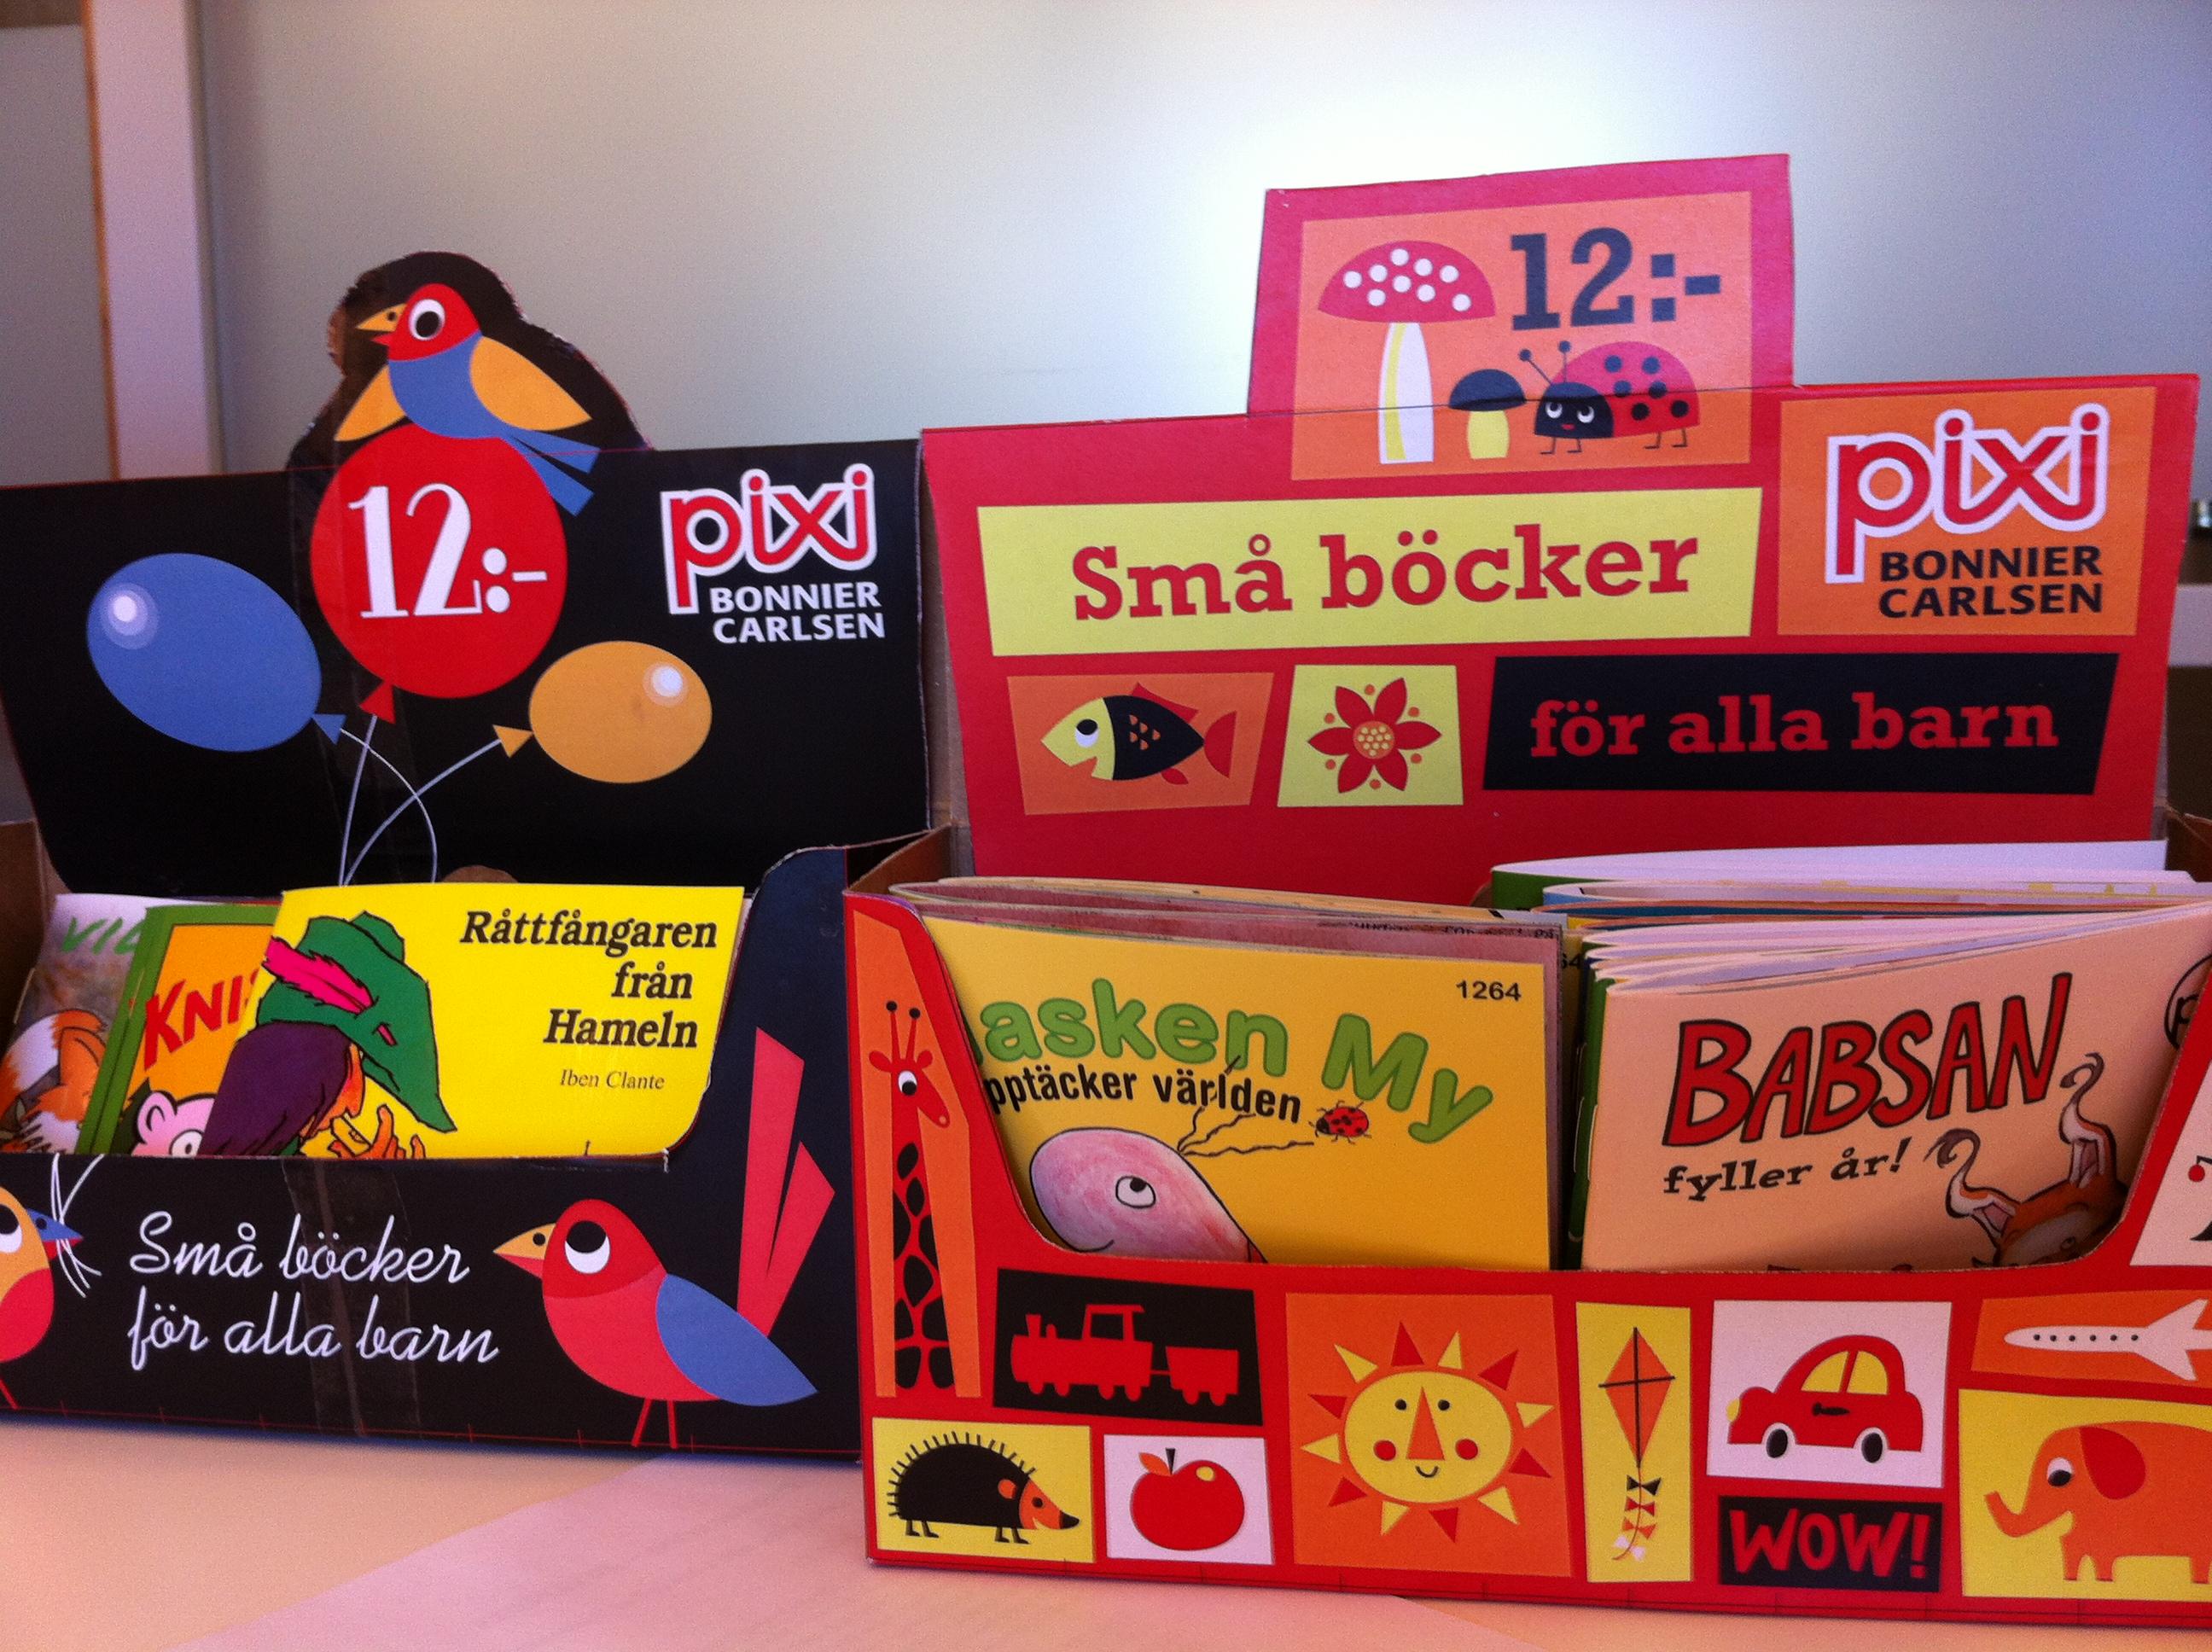 Sveriges Mest Lasta Bok Bonnier Carlsens Blogg